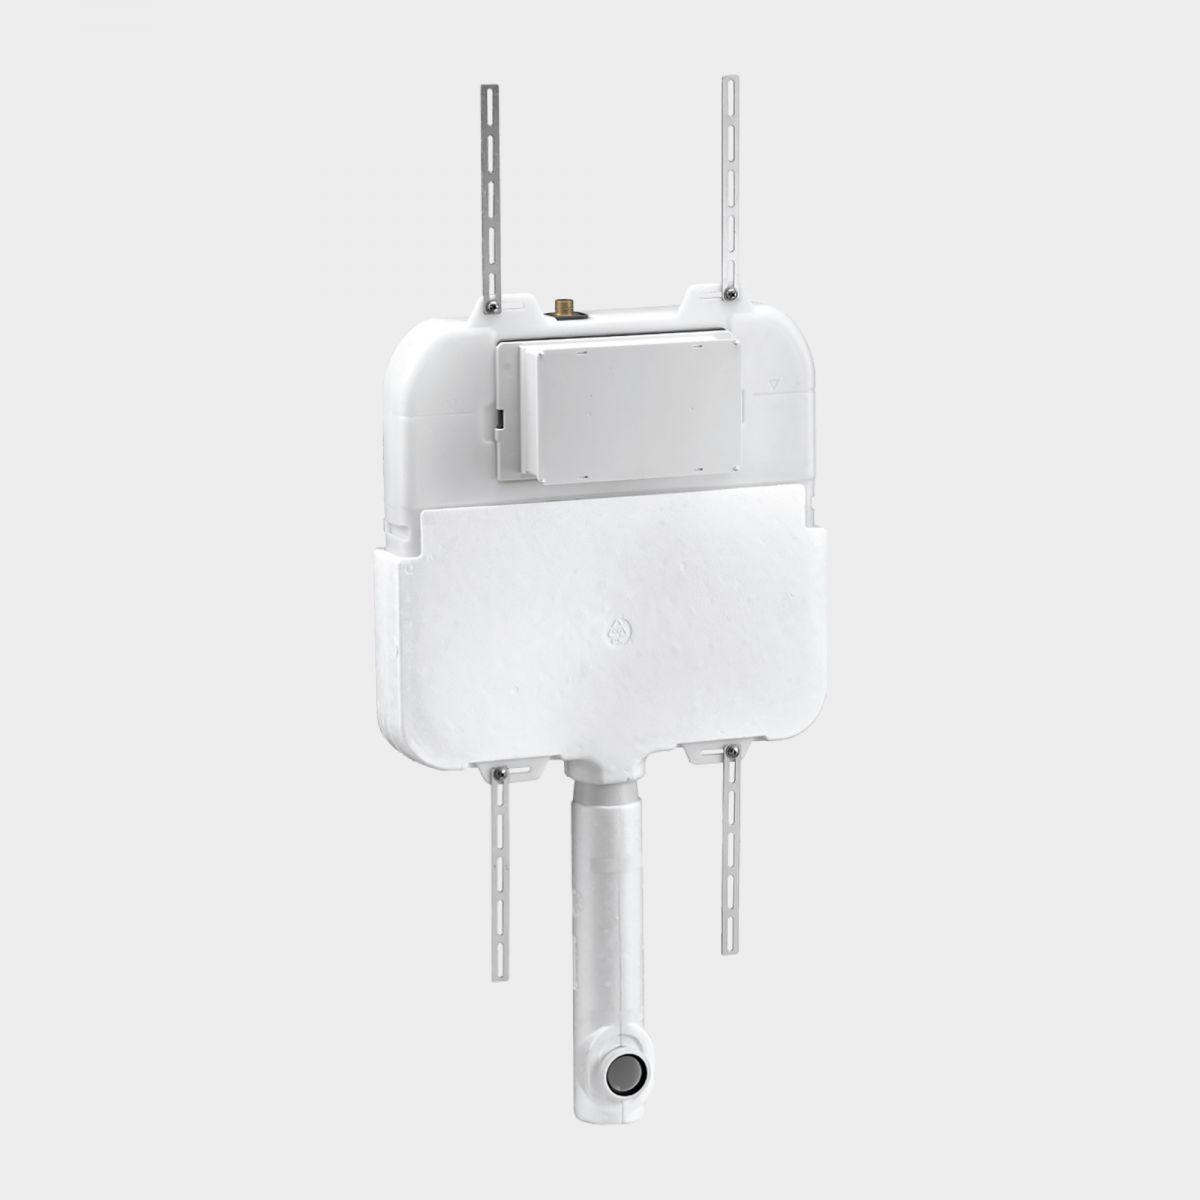 Pneumatic In-Wall Toilet Cistern